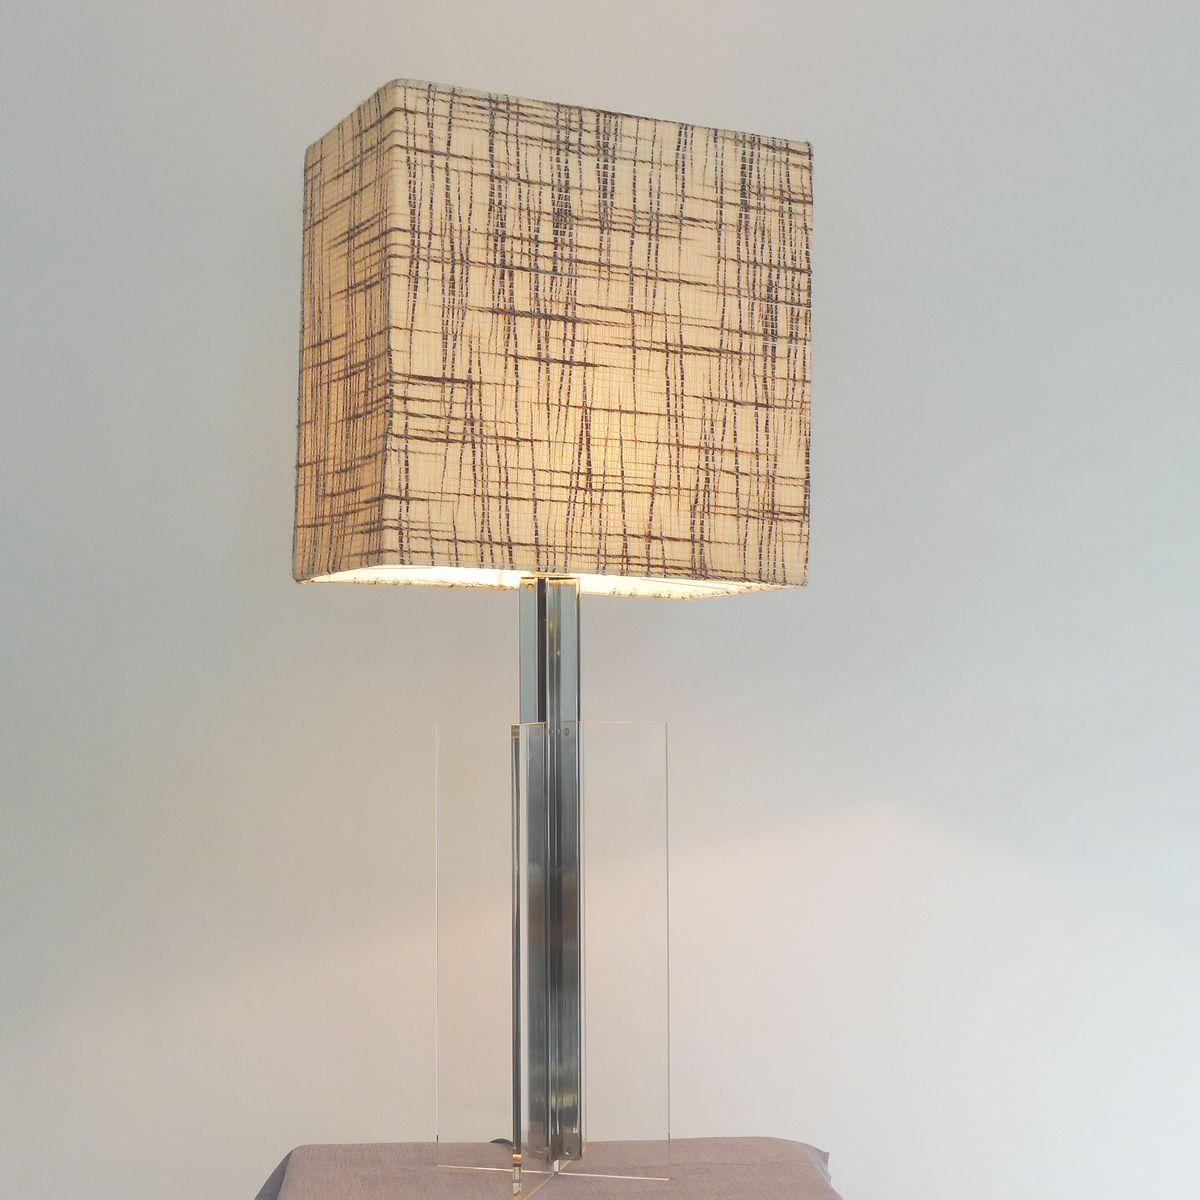 grande lampe de bureau en plexiglas transparent 1970s en vente sur pamono. Black Bedroom Furniture Sets. Home Design Ideas